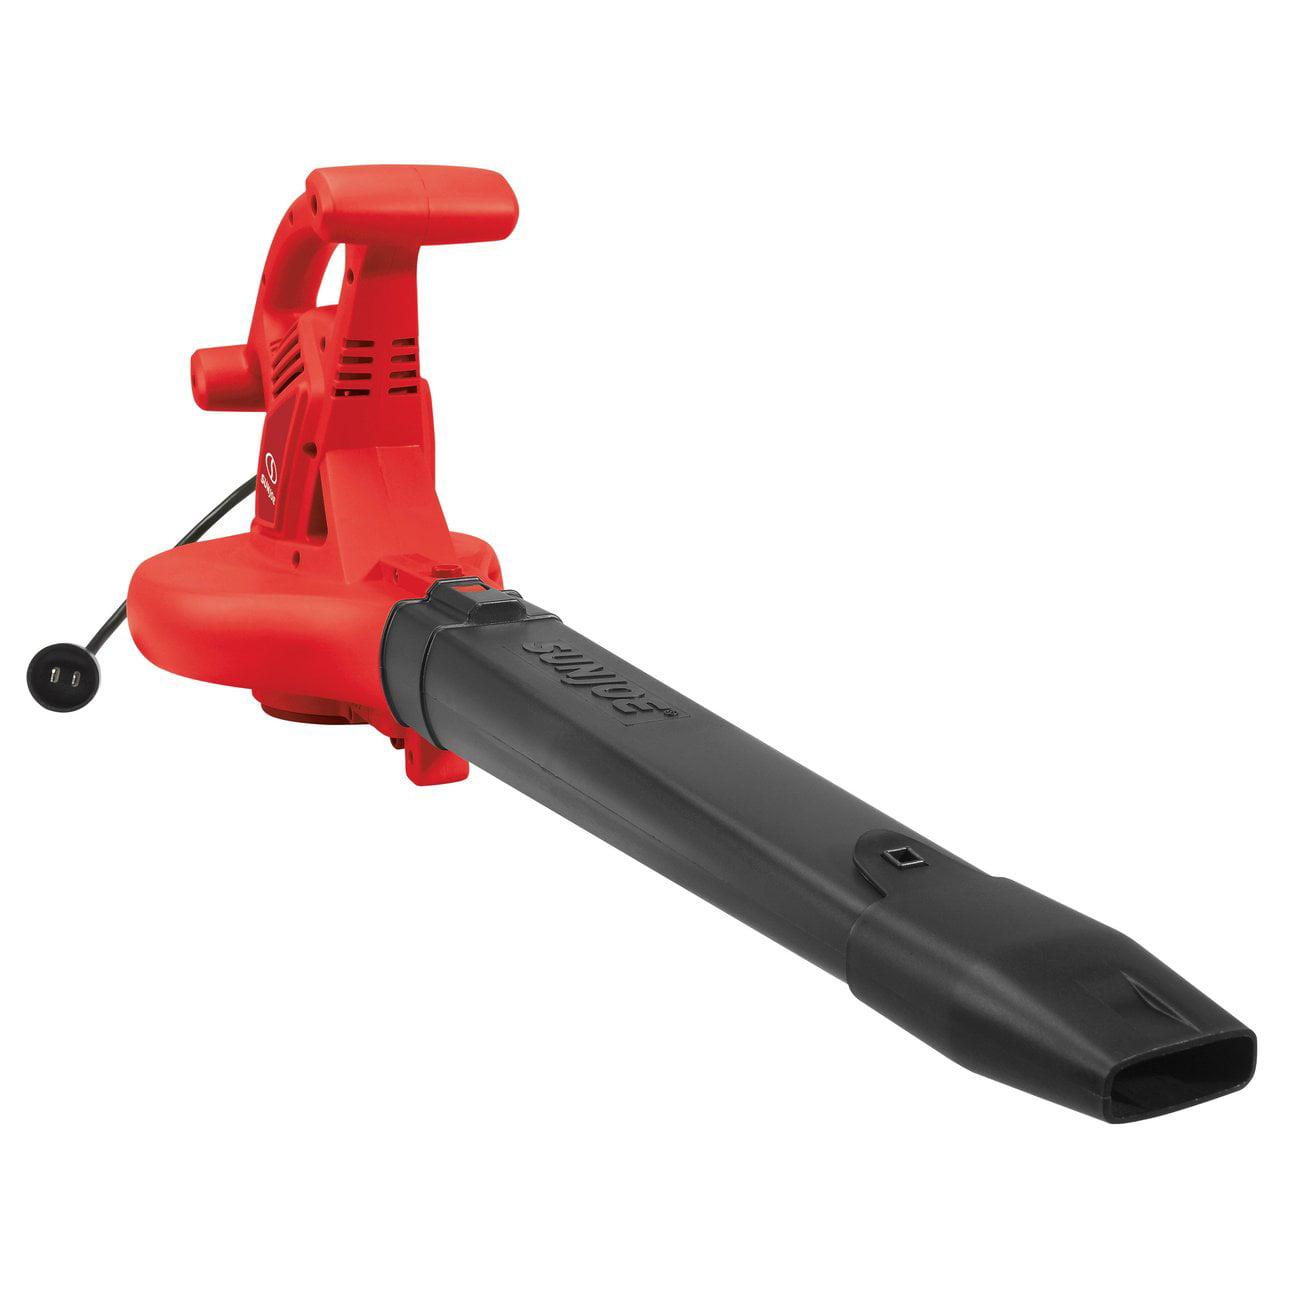 (Open Box) Snow Joe Sun Joe SBJ606E-GA-RED 14 Amp 250MPH 4-in-1 Electric Leaf Blower | Vacuum | Mulcher | Gutter Cleaner, RED